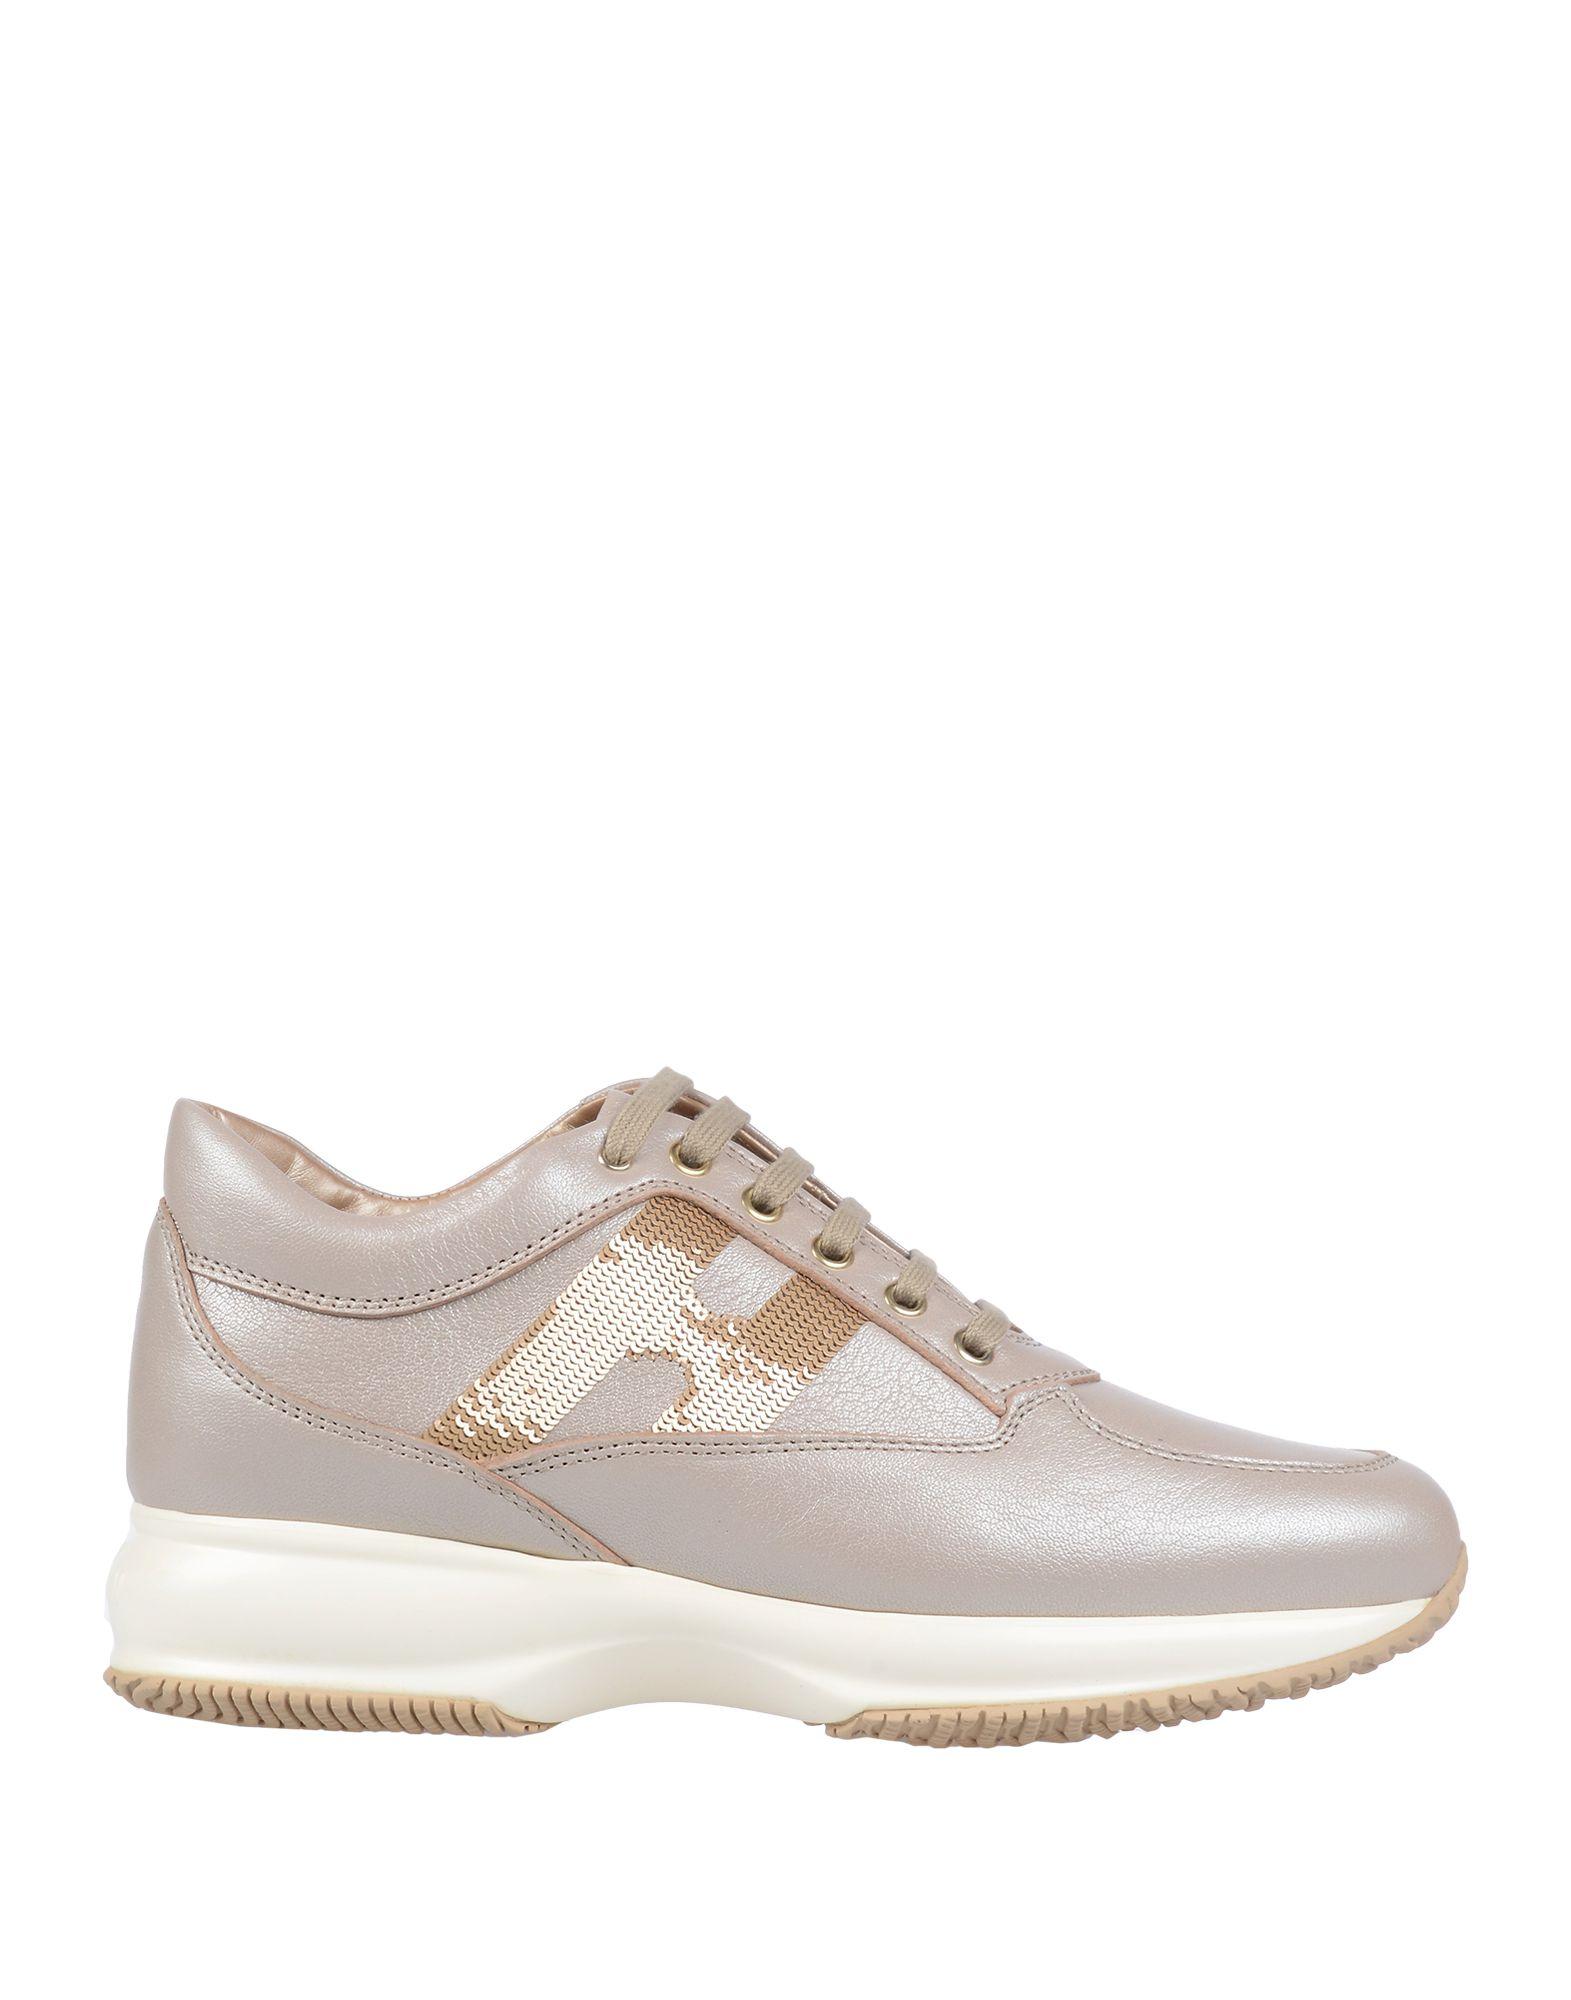 Hogan Sneakers - Women Hogan United Sneakers online on  United Hogan Kingdom - 11567791SS f05527